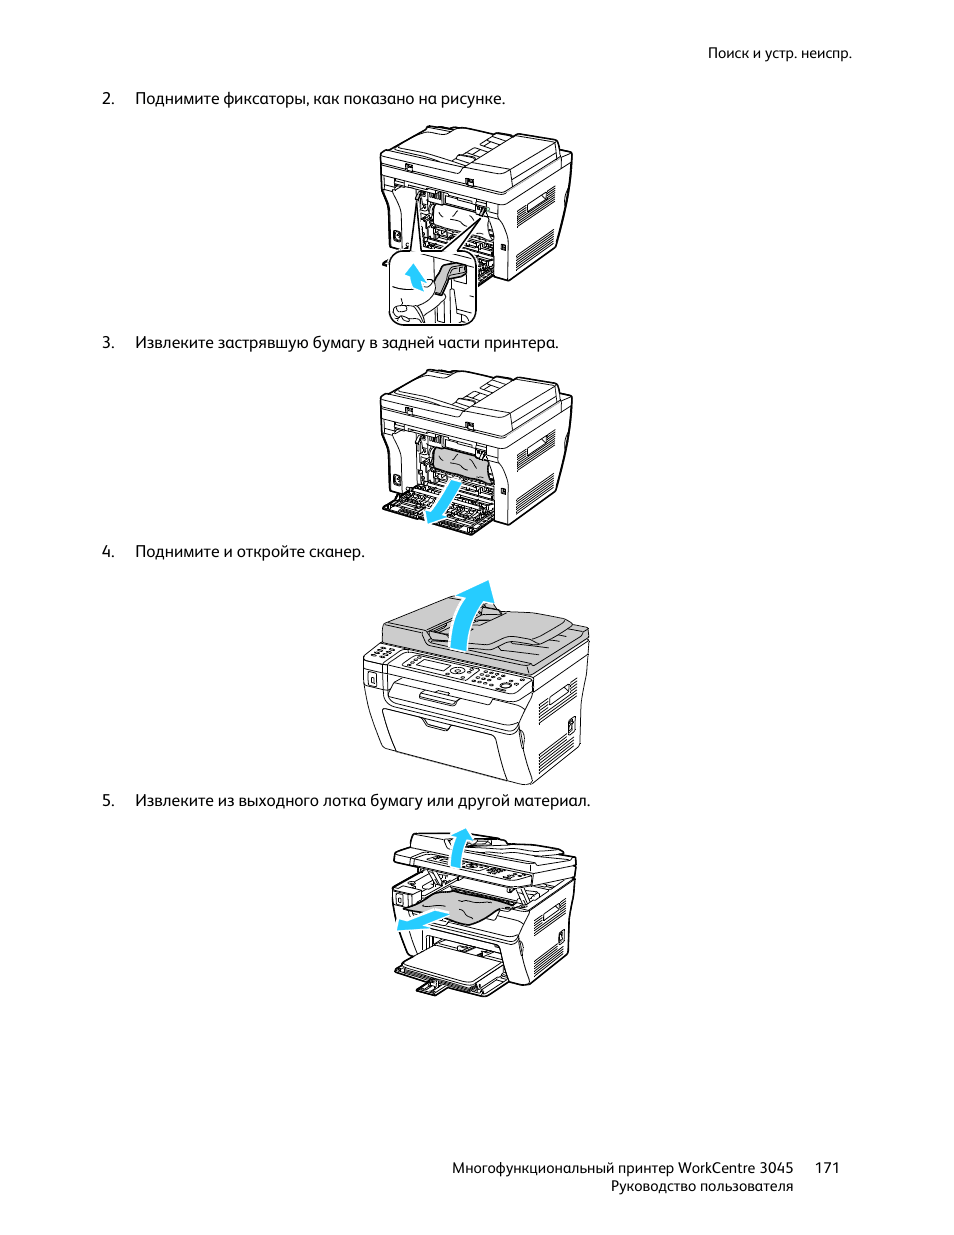 Инструкция по эксплуатации Xerox WorkCentre 3045